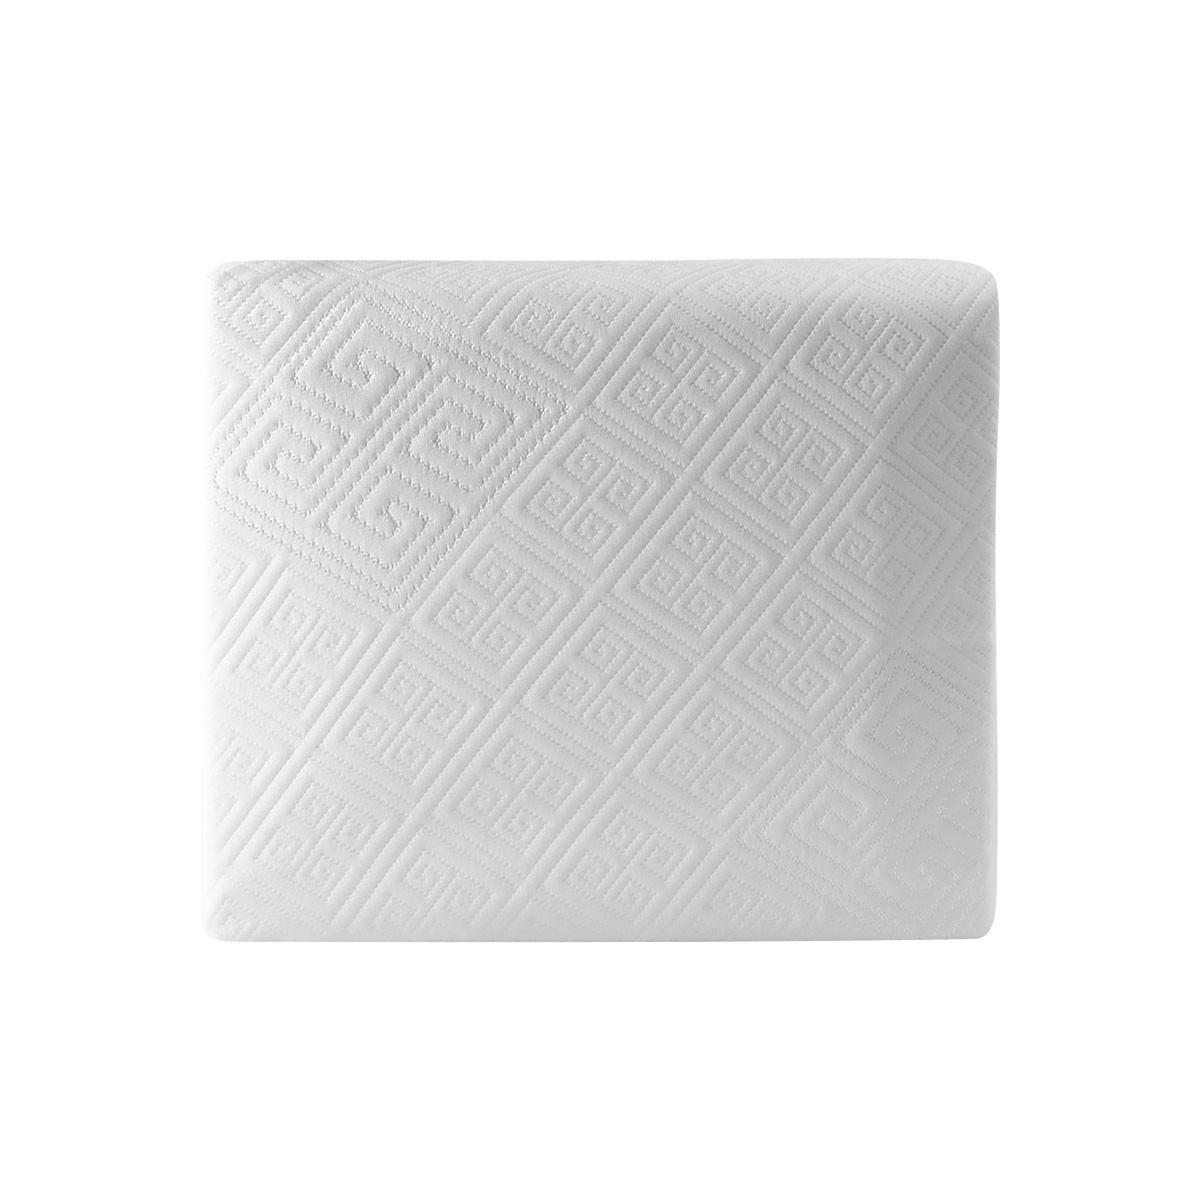 Protetor para Colchao Queen Impermeavel Juma Comfort 200 x 160cm - Branco